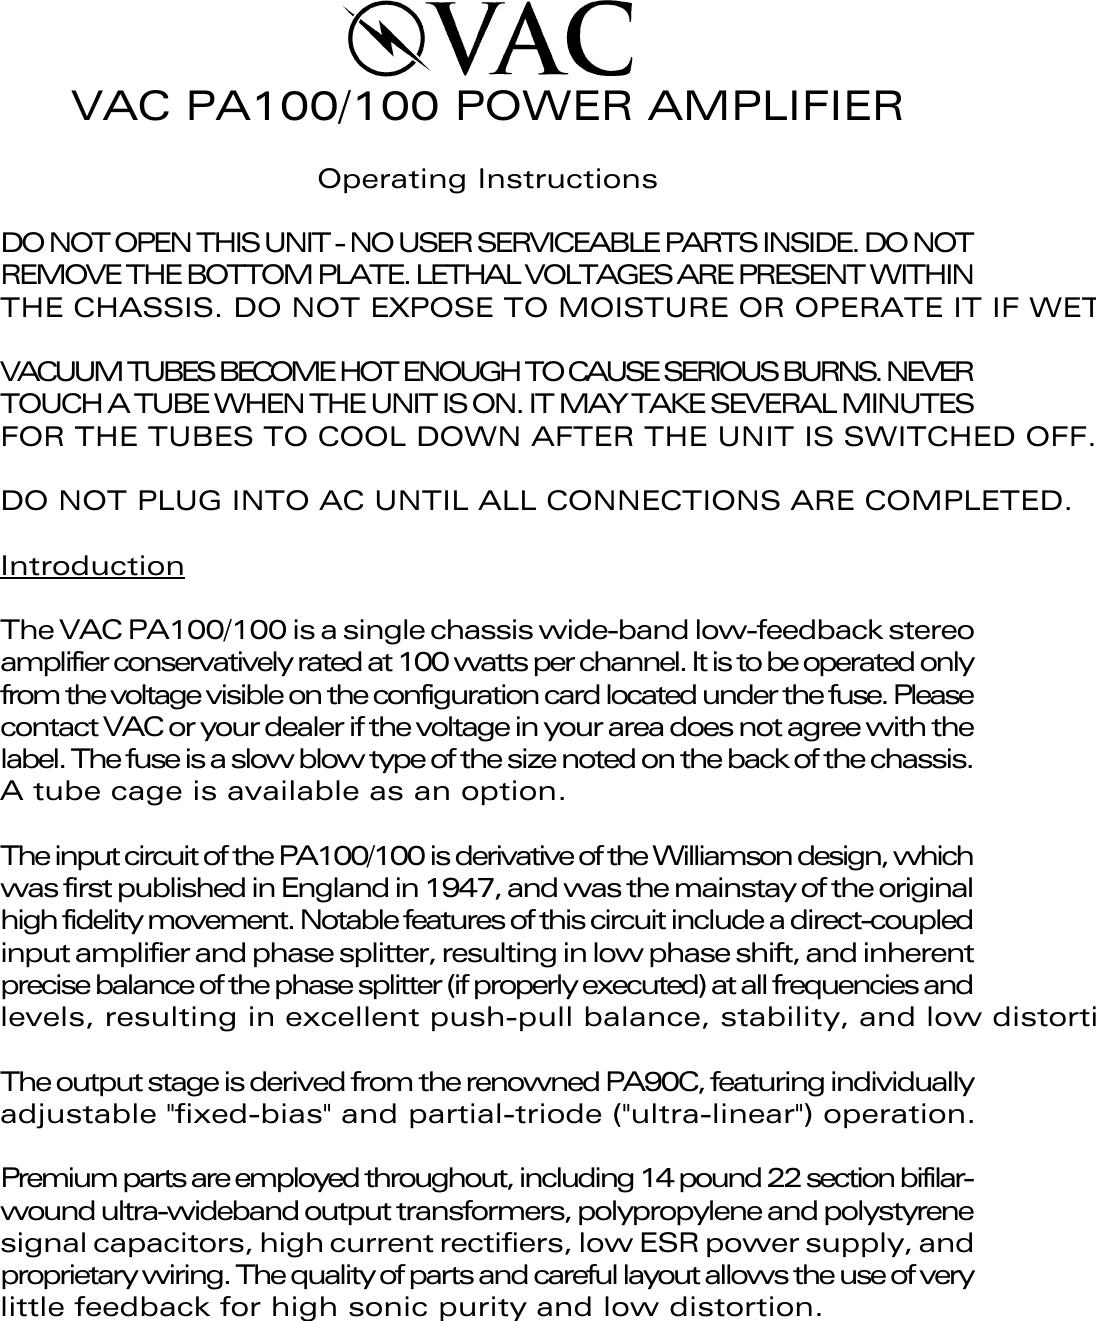 Mazda Vac Pa100 100 Users Manual Brochure 2004 Ac Plug Wiring Parts